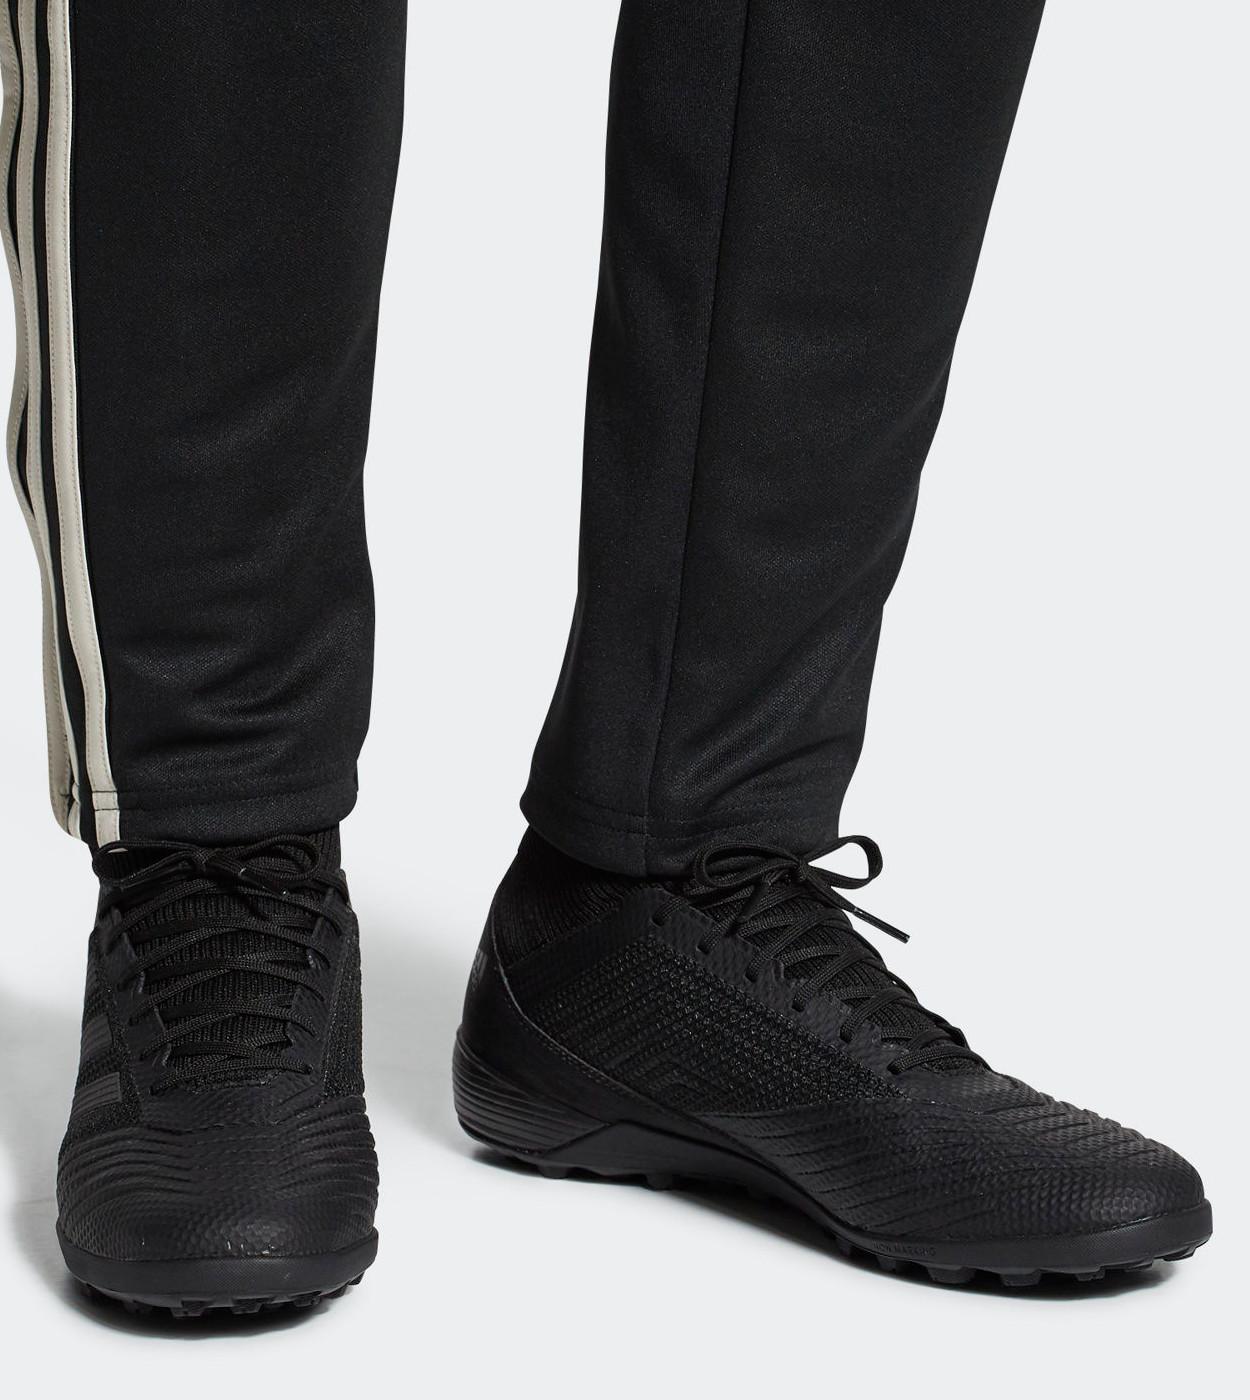 timeless design b35ee 30e6d Football-boots-shoes-Adidas-Cleats-Predator-Tango-18-